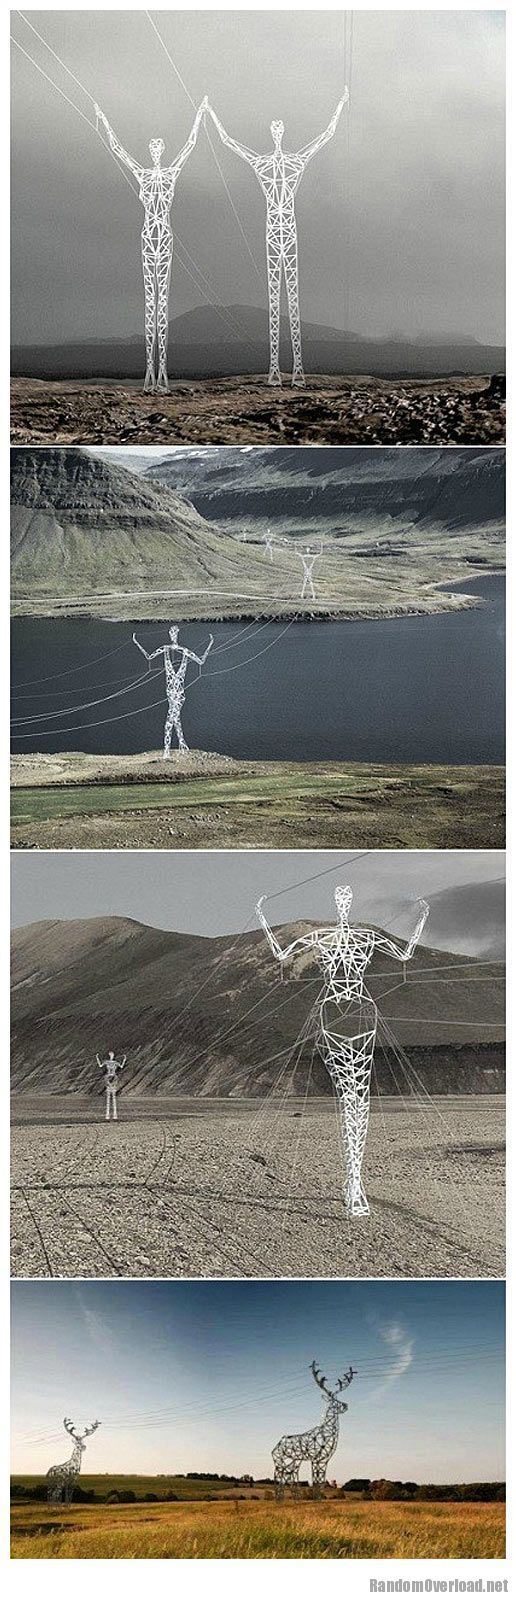 Iceland electric poles - RandomOverload